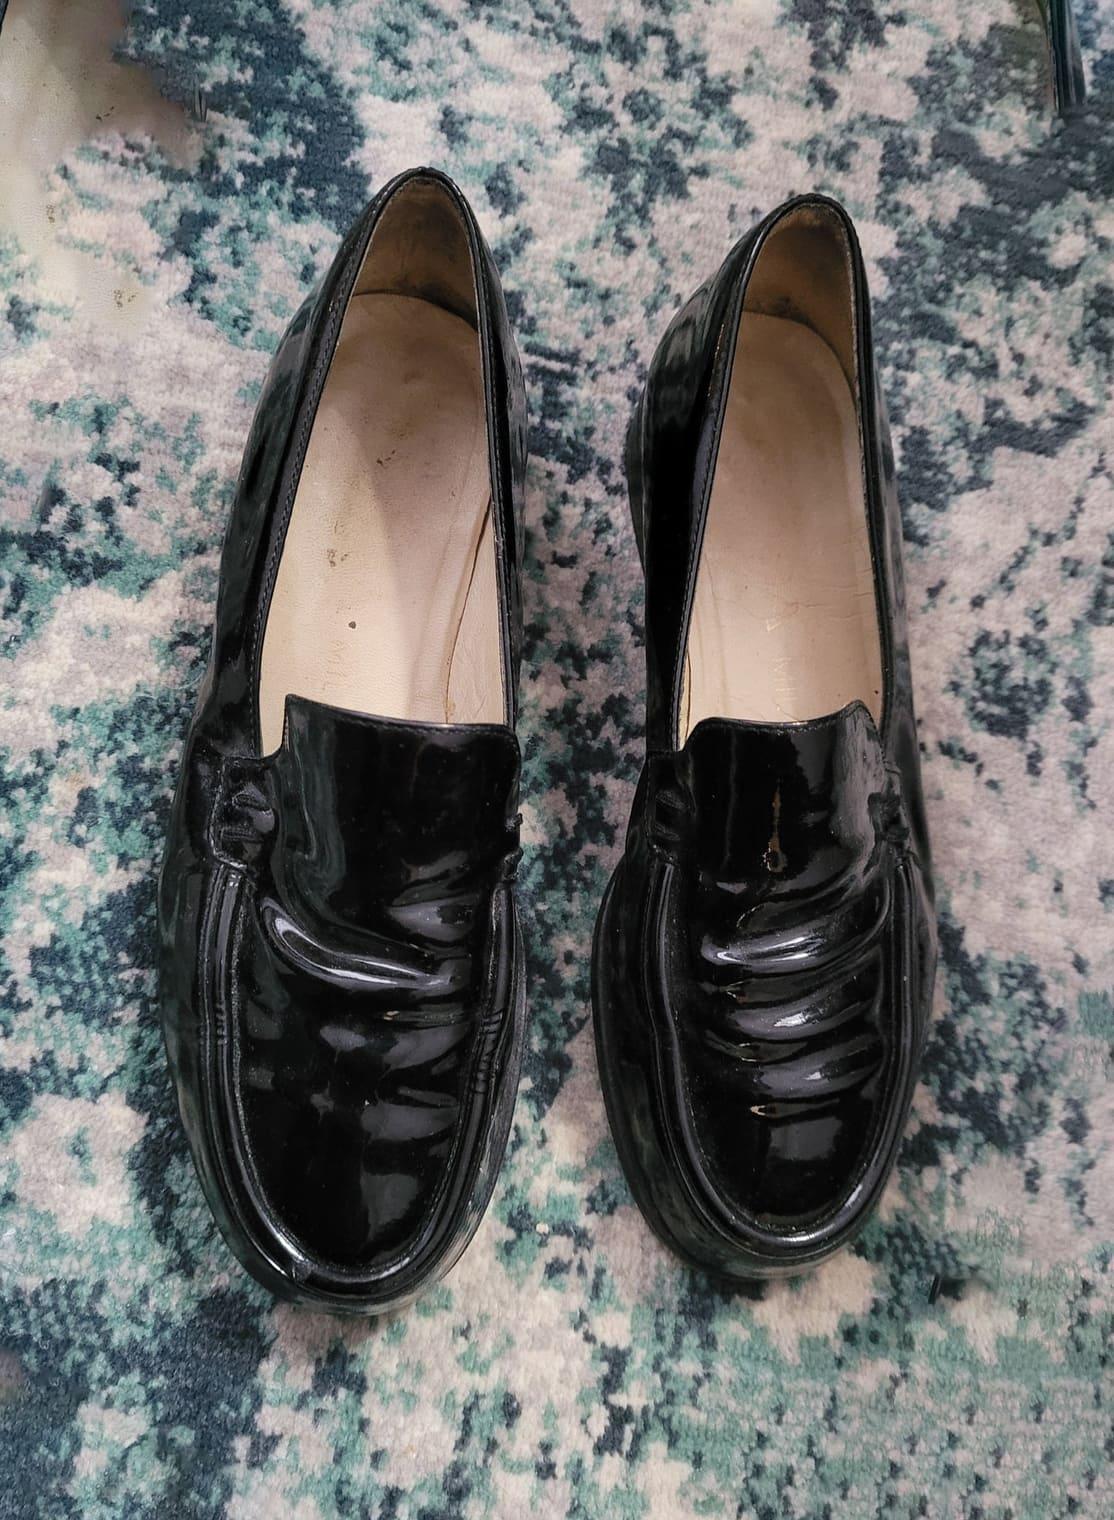 Prada patent loafers, size 36